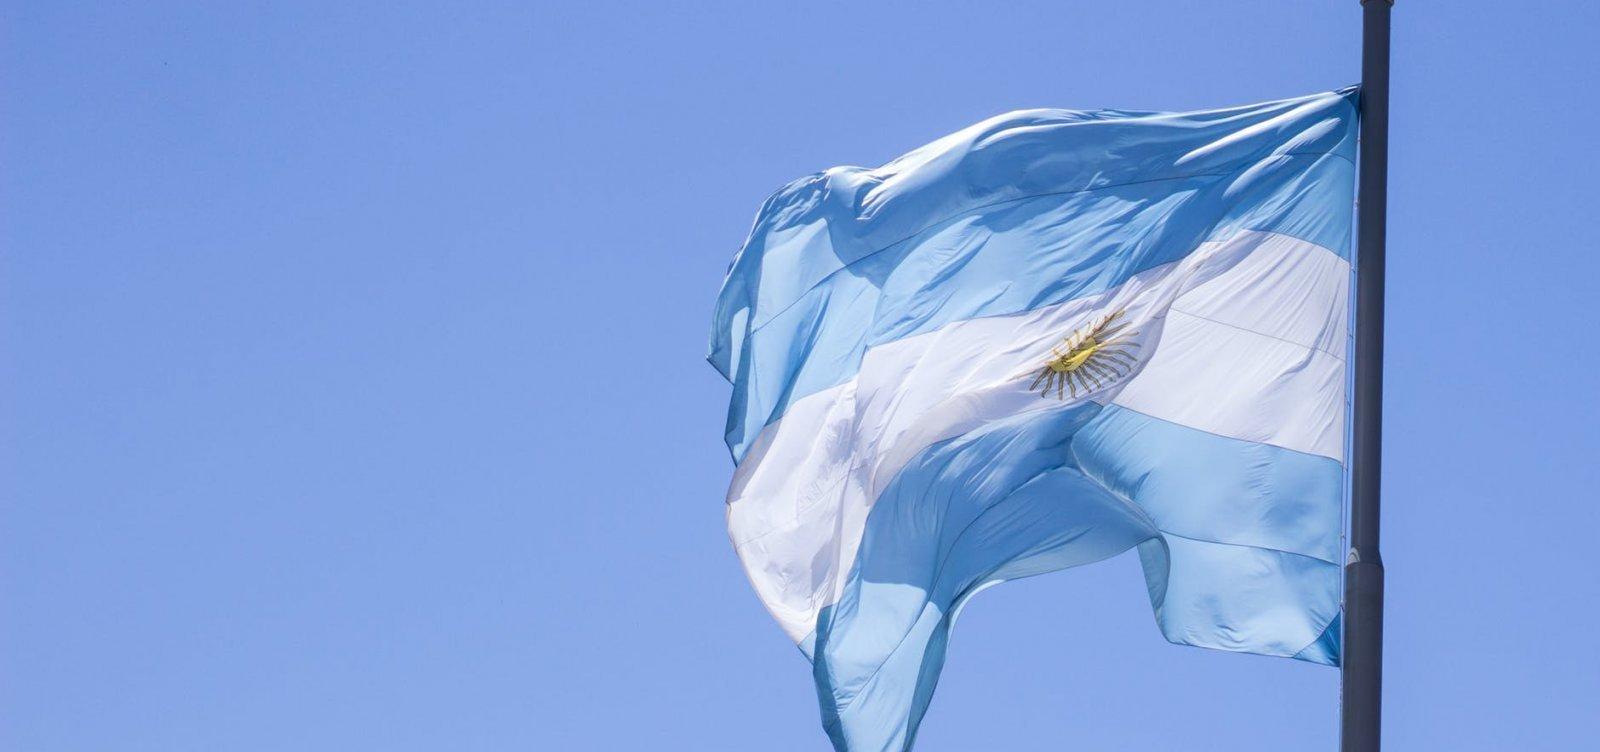 Para controlar infecções por variante Delta, Argentina endurece controle de fronteiras